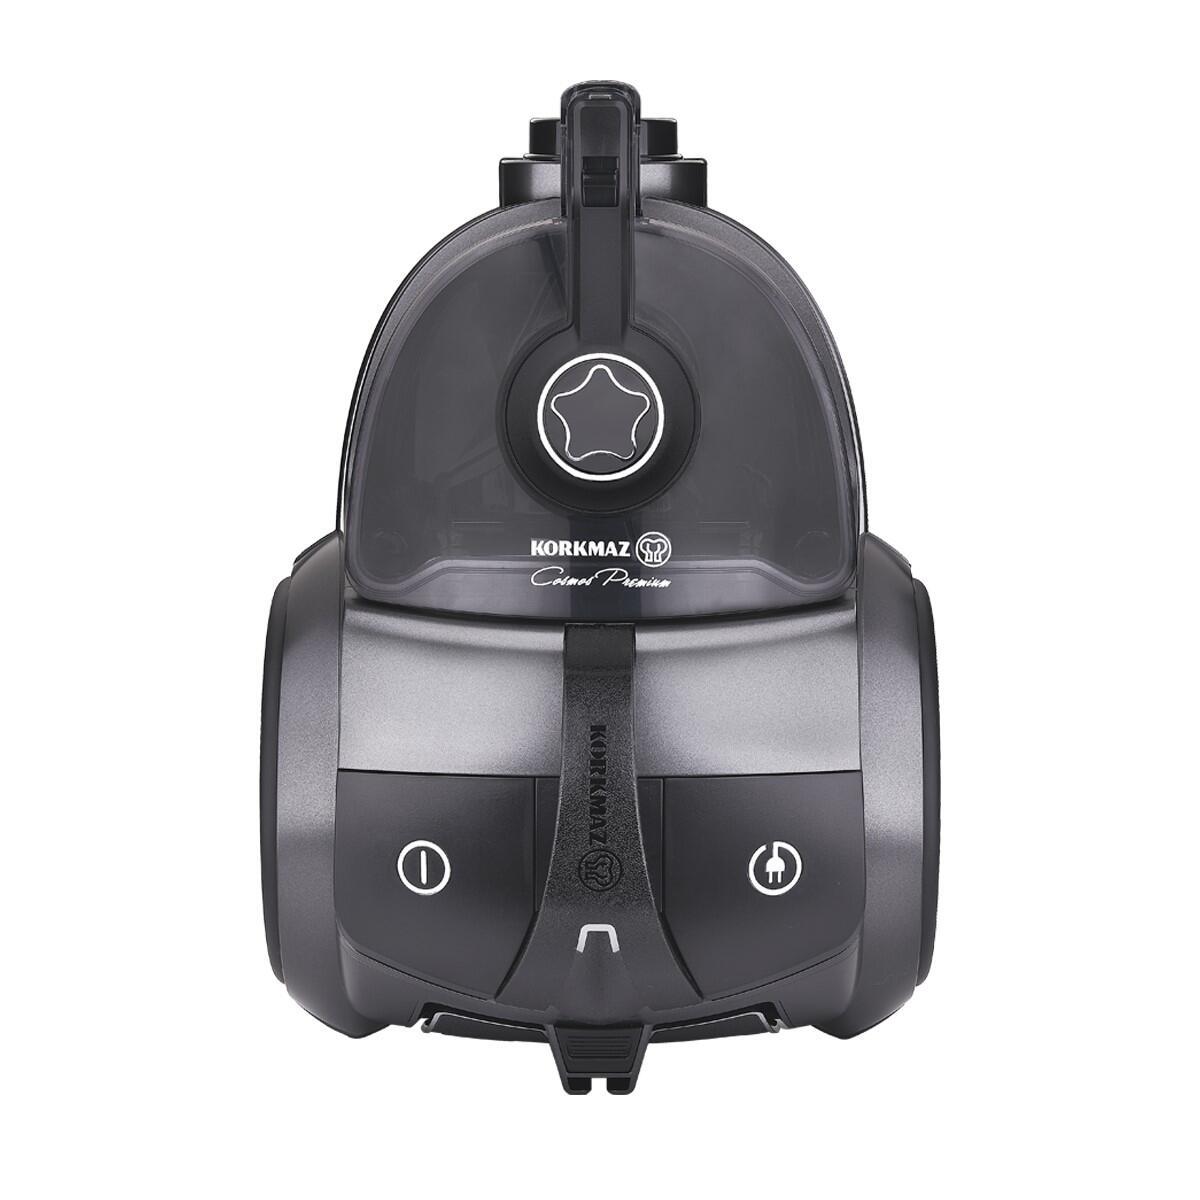 Korkmaz Cosmos Premium Antrasit/Siyah Elektrikli Süpürge